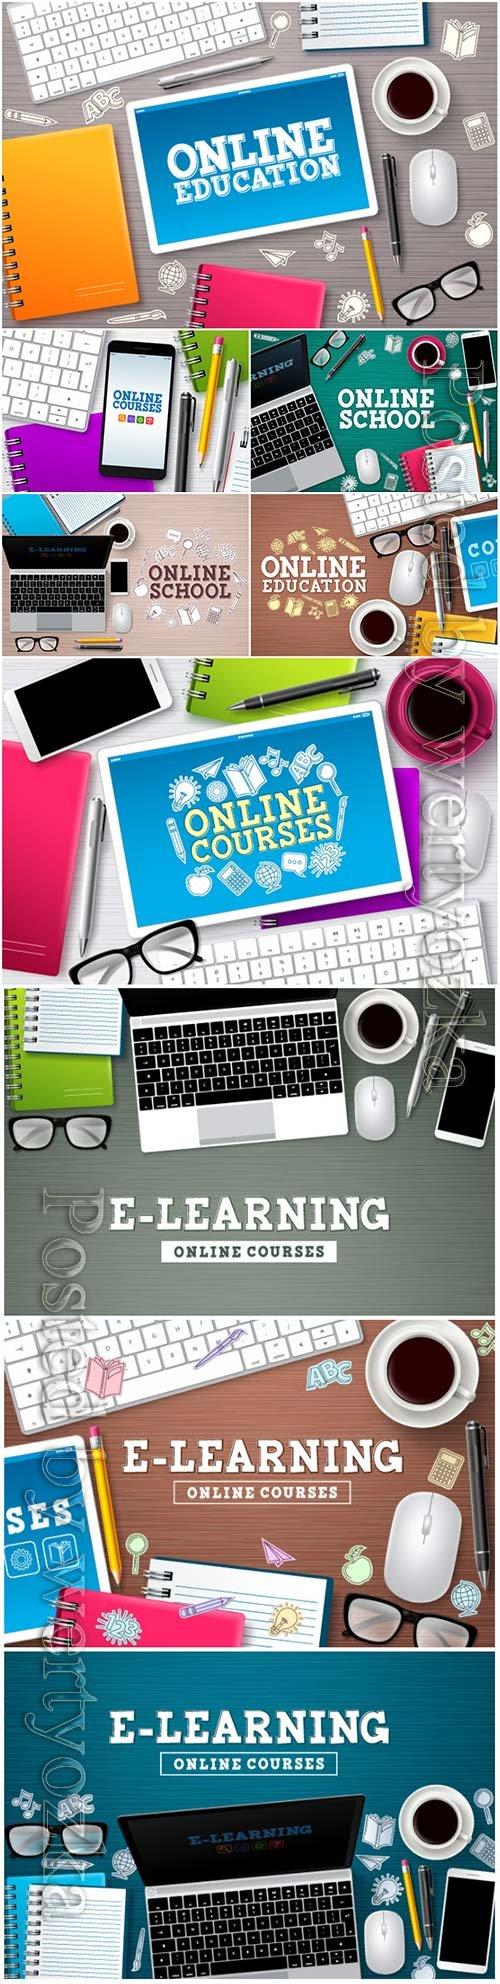 Online education elearning vector banner